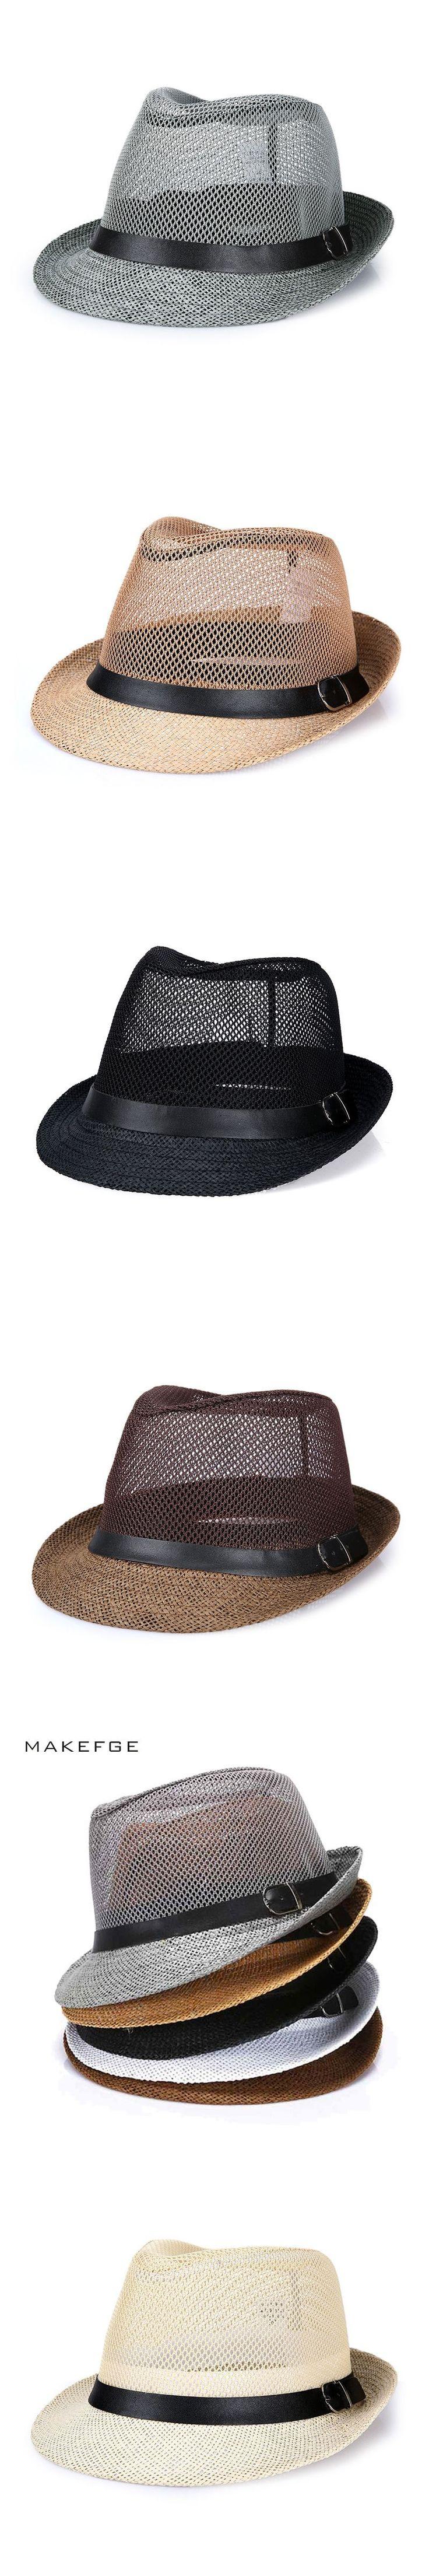 cuban style hats  Fashion Mens Summer Jazz Hat Breathable Casual Floppy Jazz Hat for Men and Women Popular Black Fedora Cap #HatsForWomenFloppy